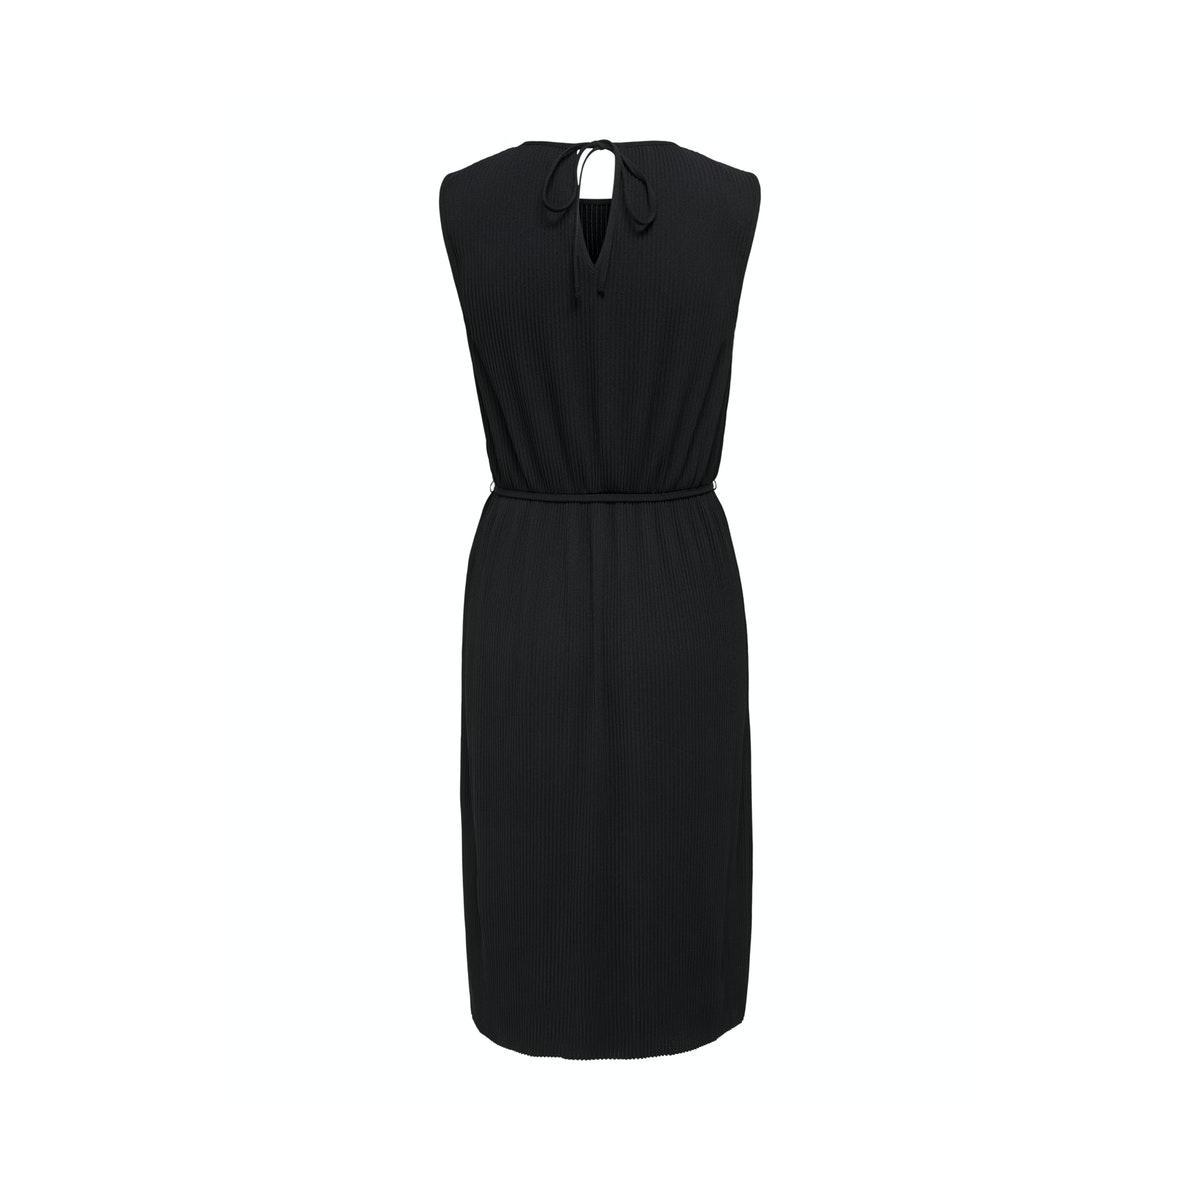 jdymatunna s/l dress jrs 15204896 jacqueline de yong jurk black/end stoppe